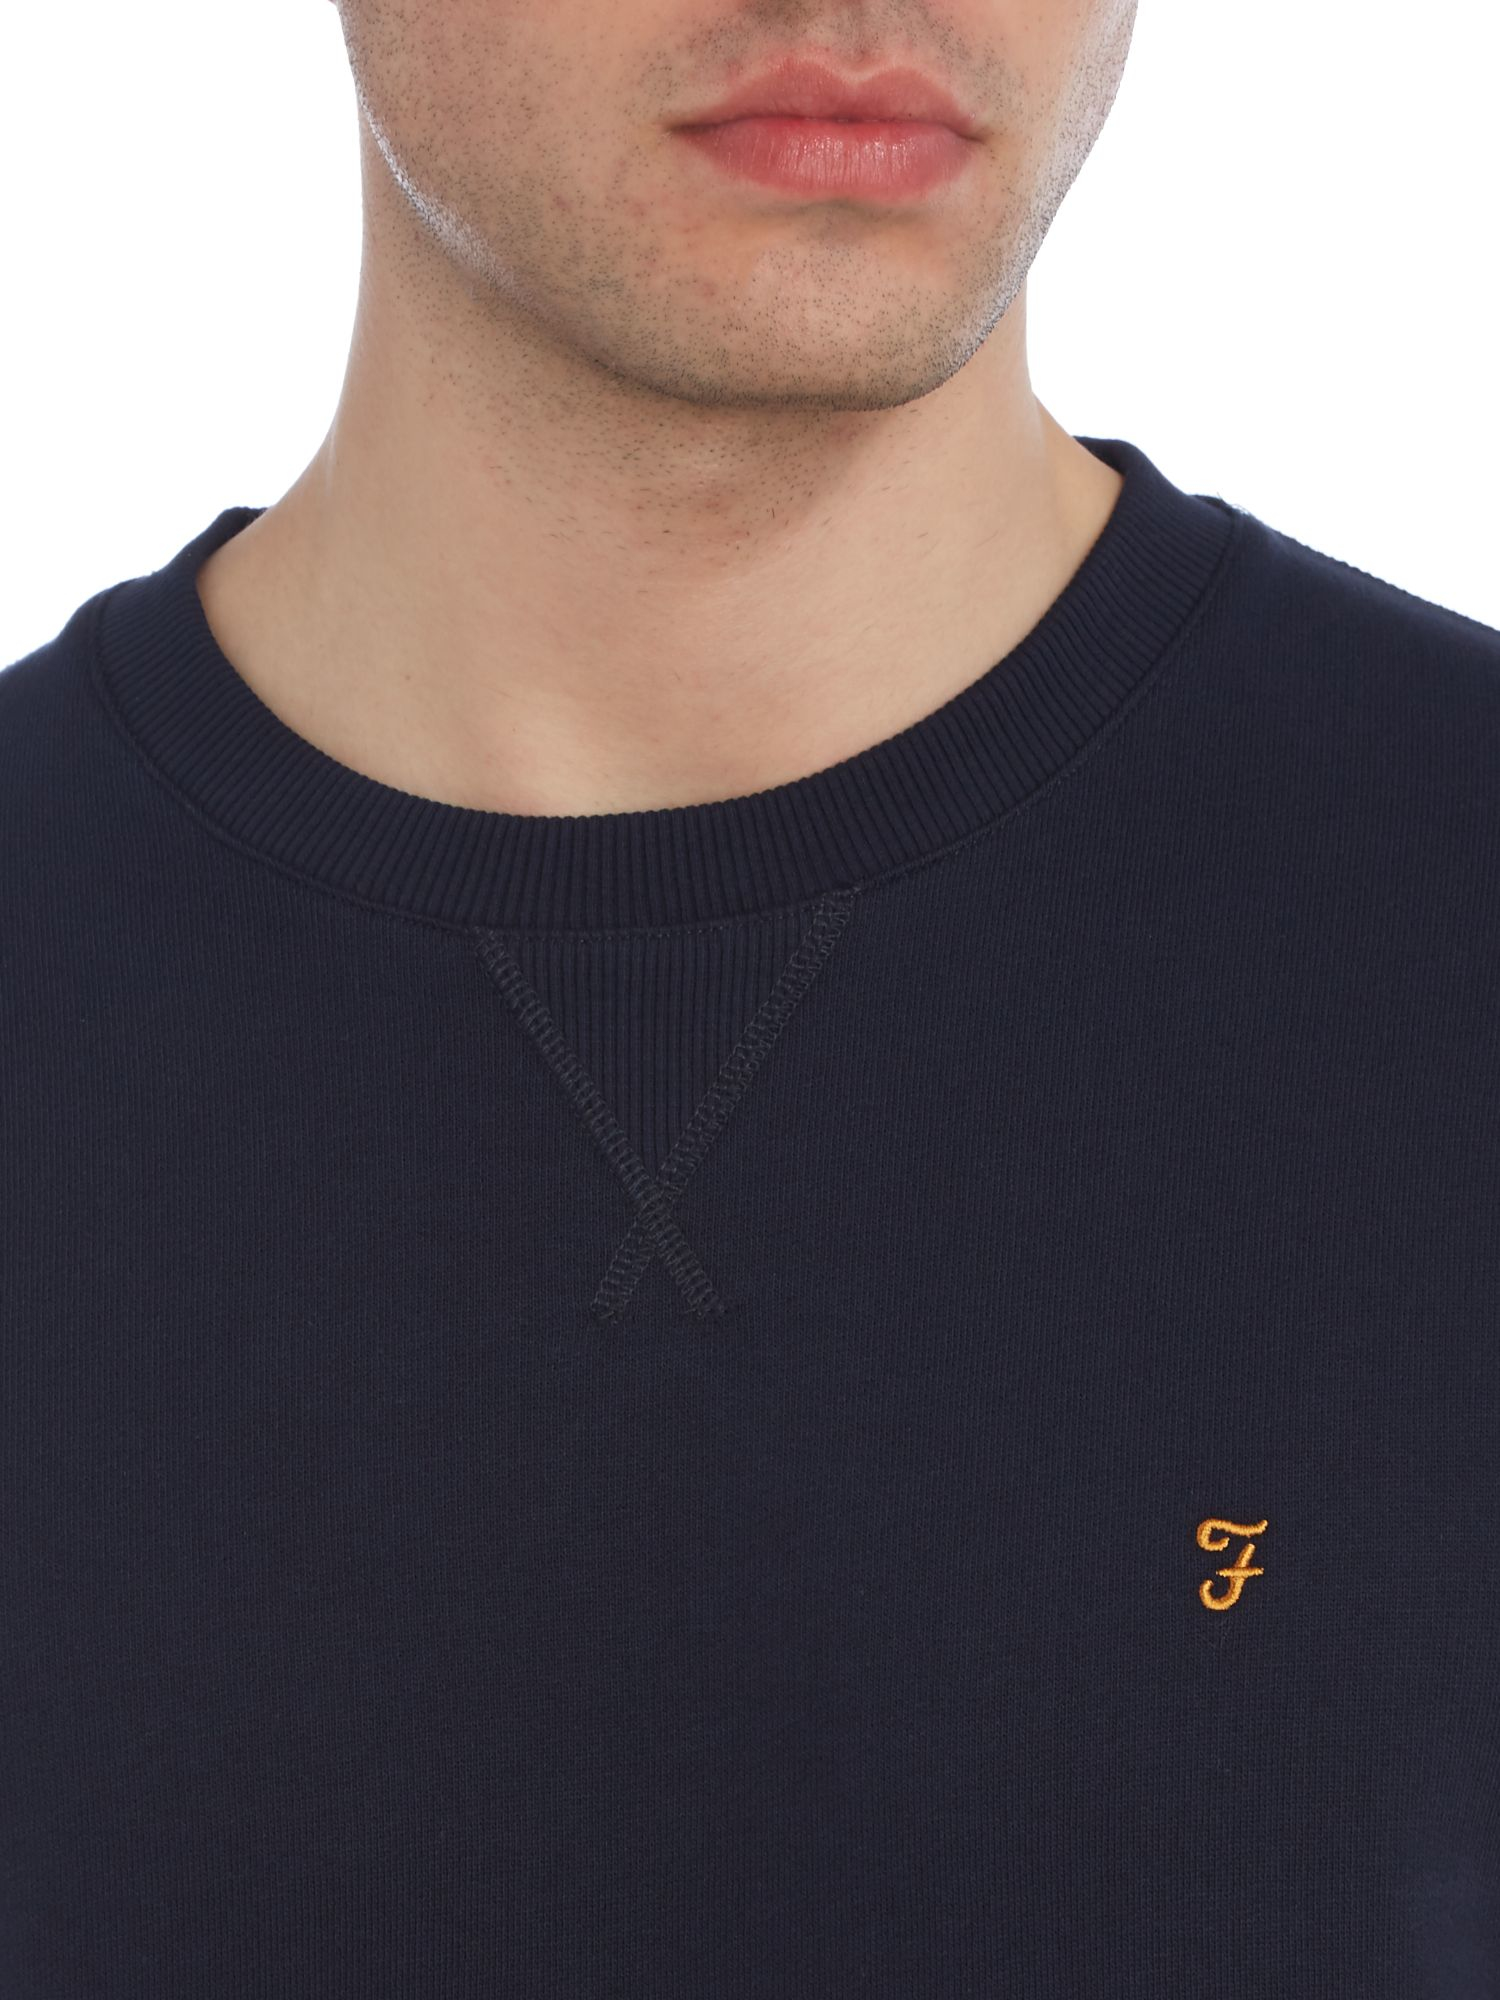 Farah Cotton Bernard Regular Fit Loopback Crew Neck Sweat in Navy (Blue) for Men